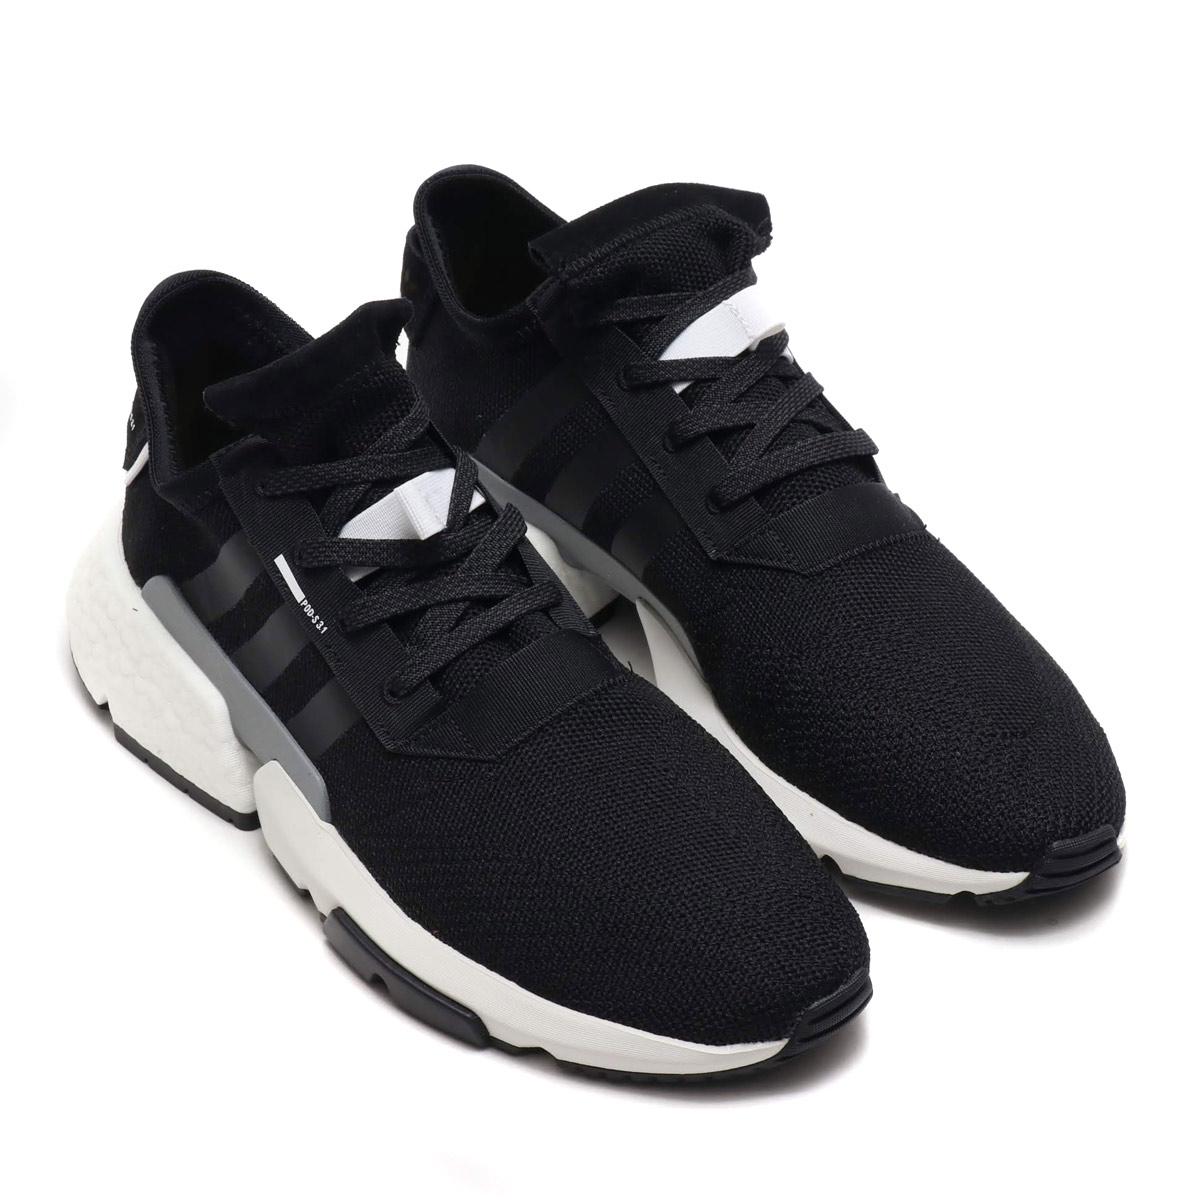 adidas Originals POD-S3.1 (アディダスオリジナルス POD-S3.1)CORE BLACK/CORE BLACK/REFLECTIVE SILVER【メンズ レディース スニーカー】18FW-I